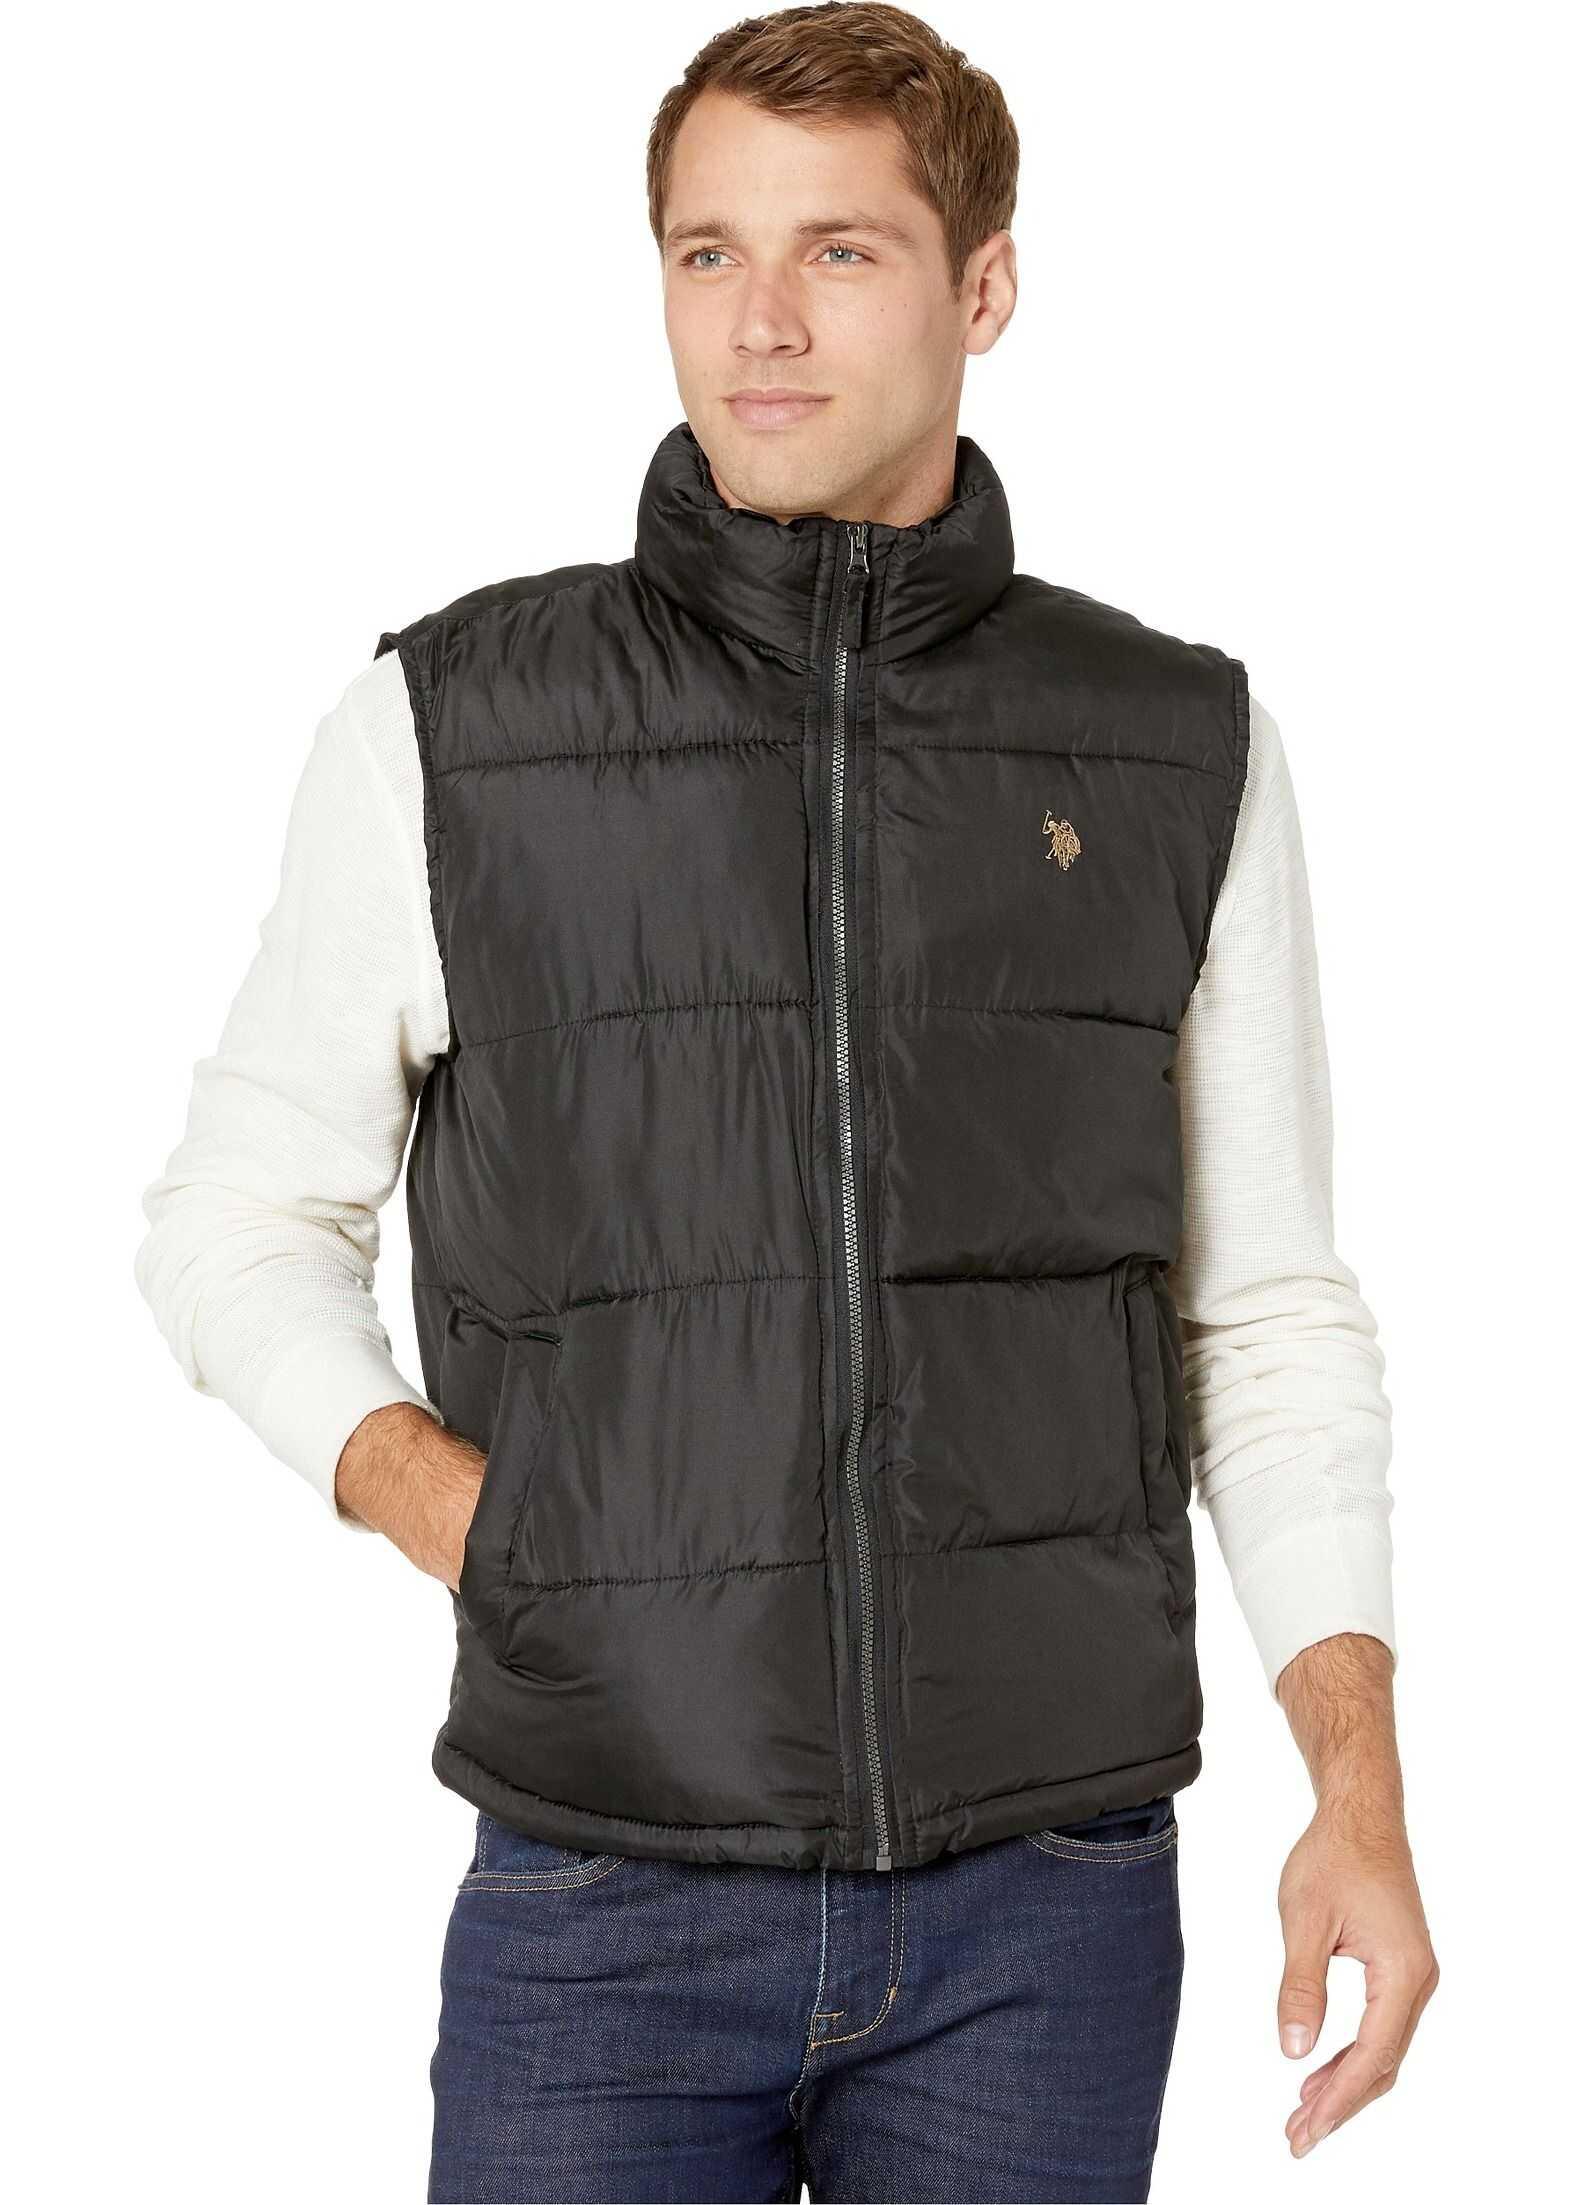 U.S. POLO ASSN. Signature Vest Black